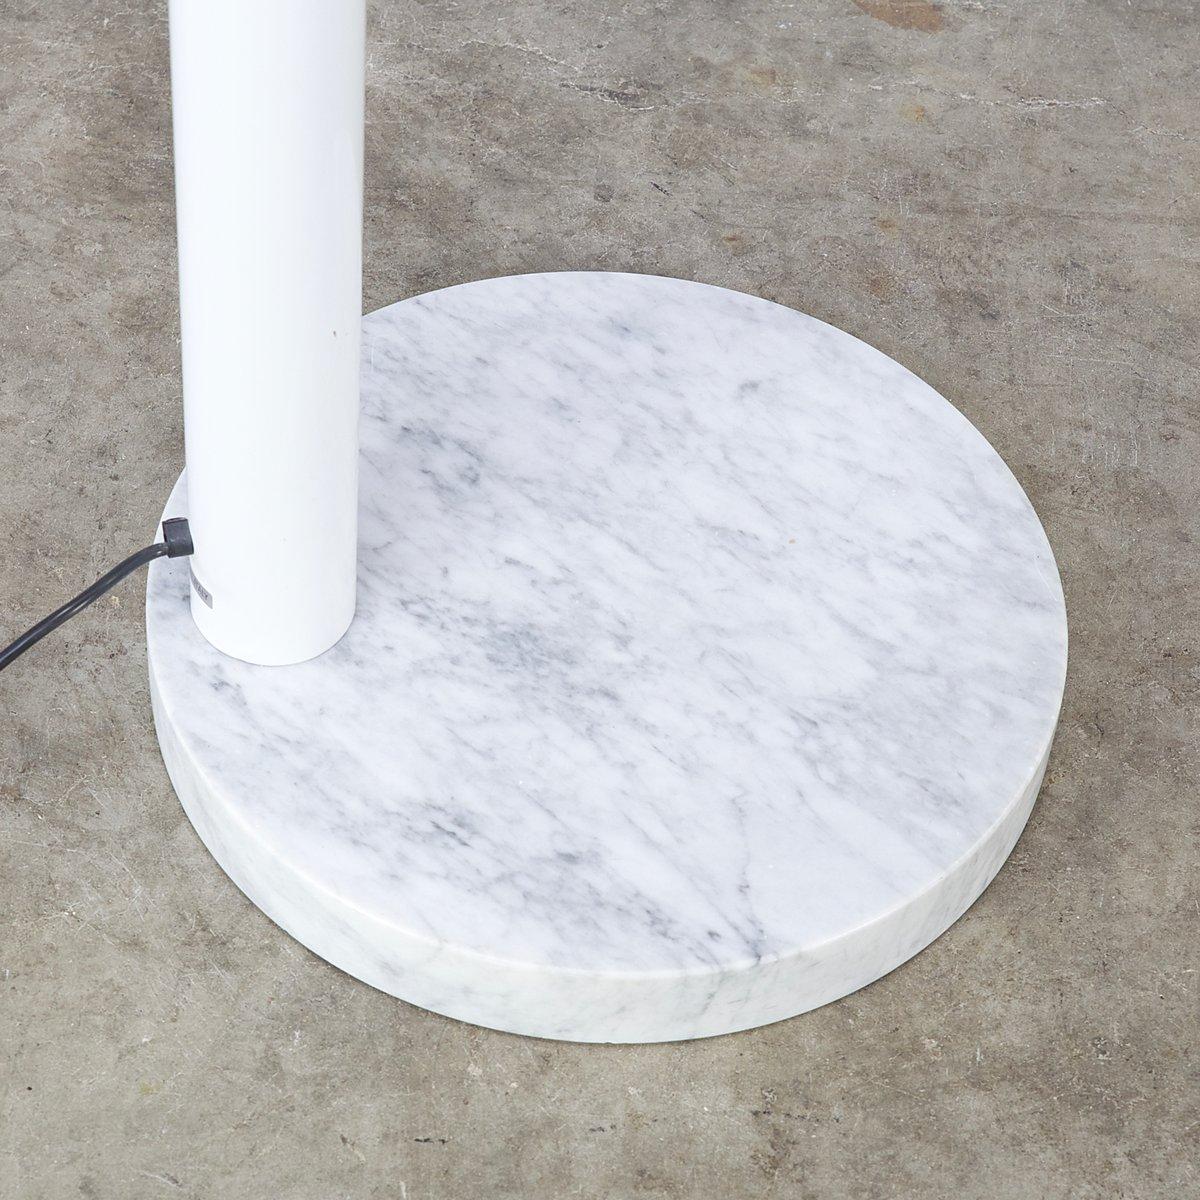 italienische bogen stehlampe aus metall chrom marmor. Black Bedroom Furniture Sets. Home Design Ideas